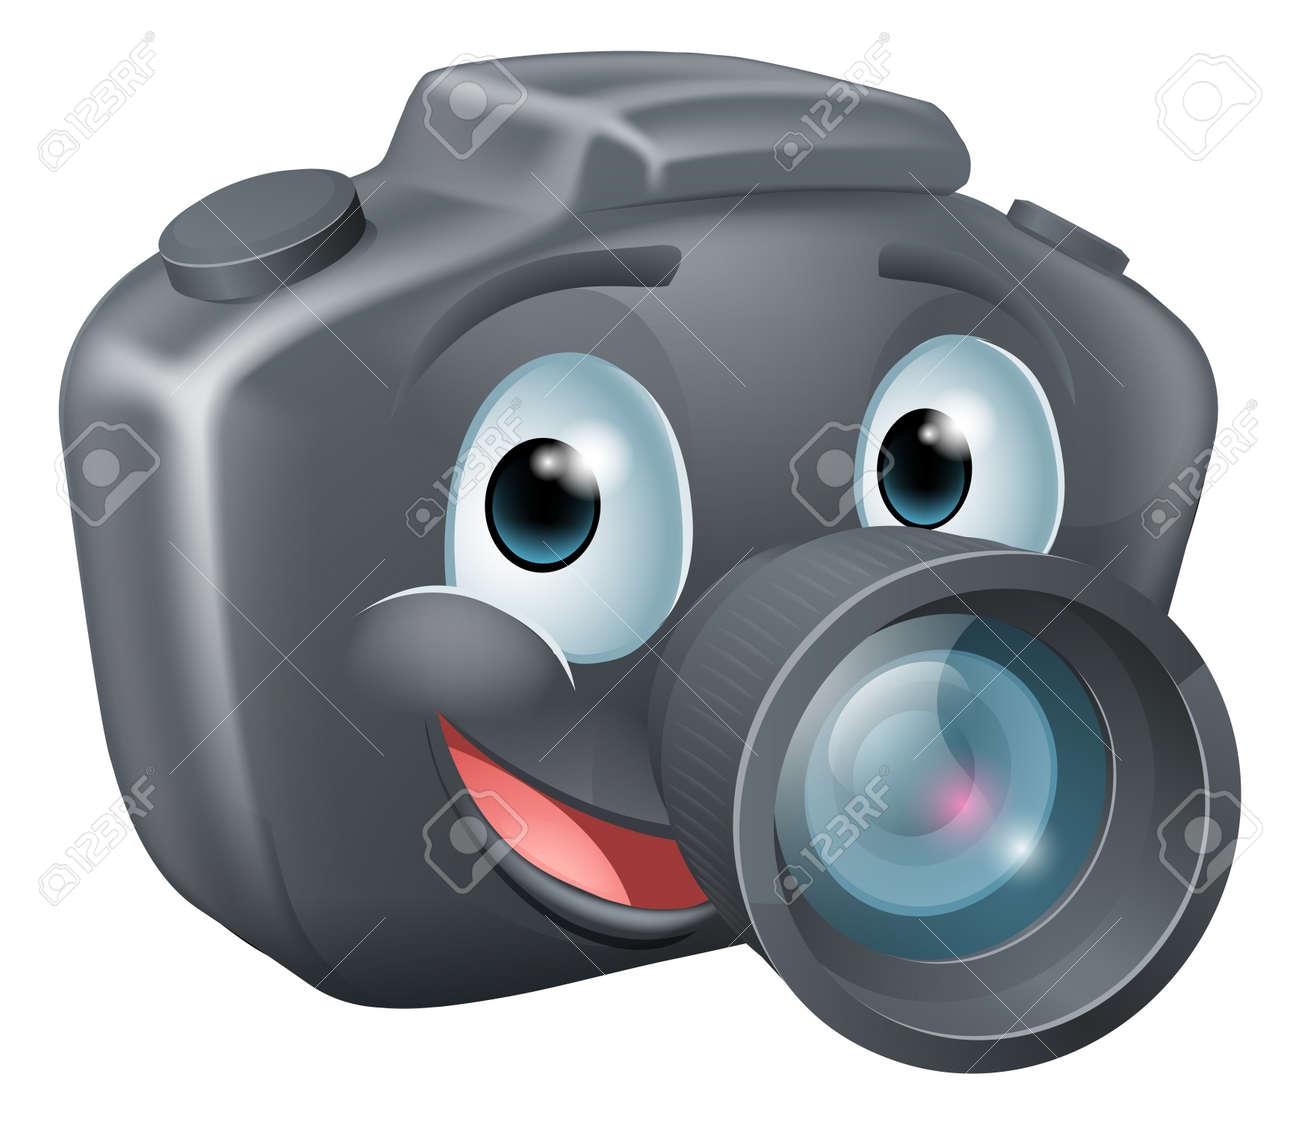 Camera Dslr Camera Cartoon illustration of a cute happy dslr camera mascot character with big smile stock vector